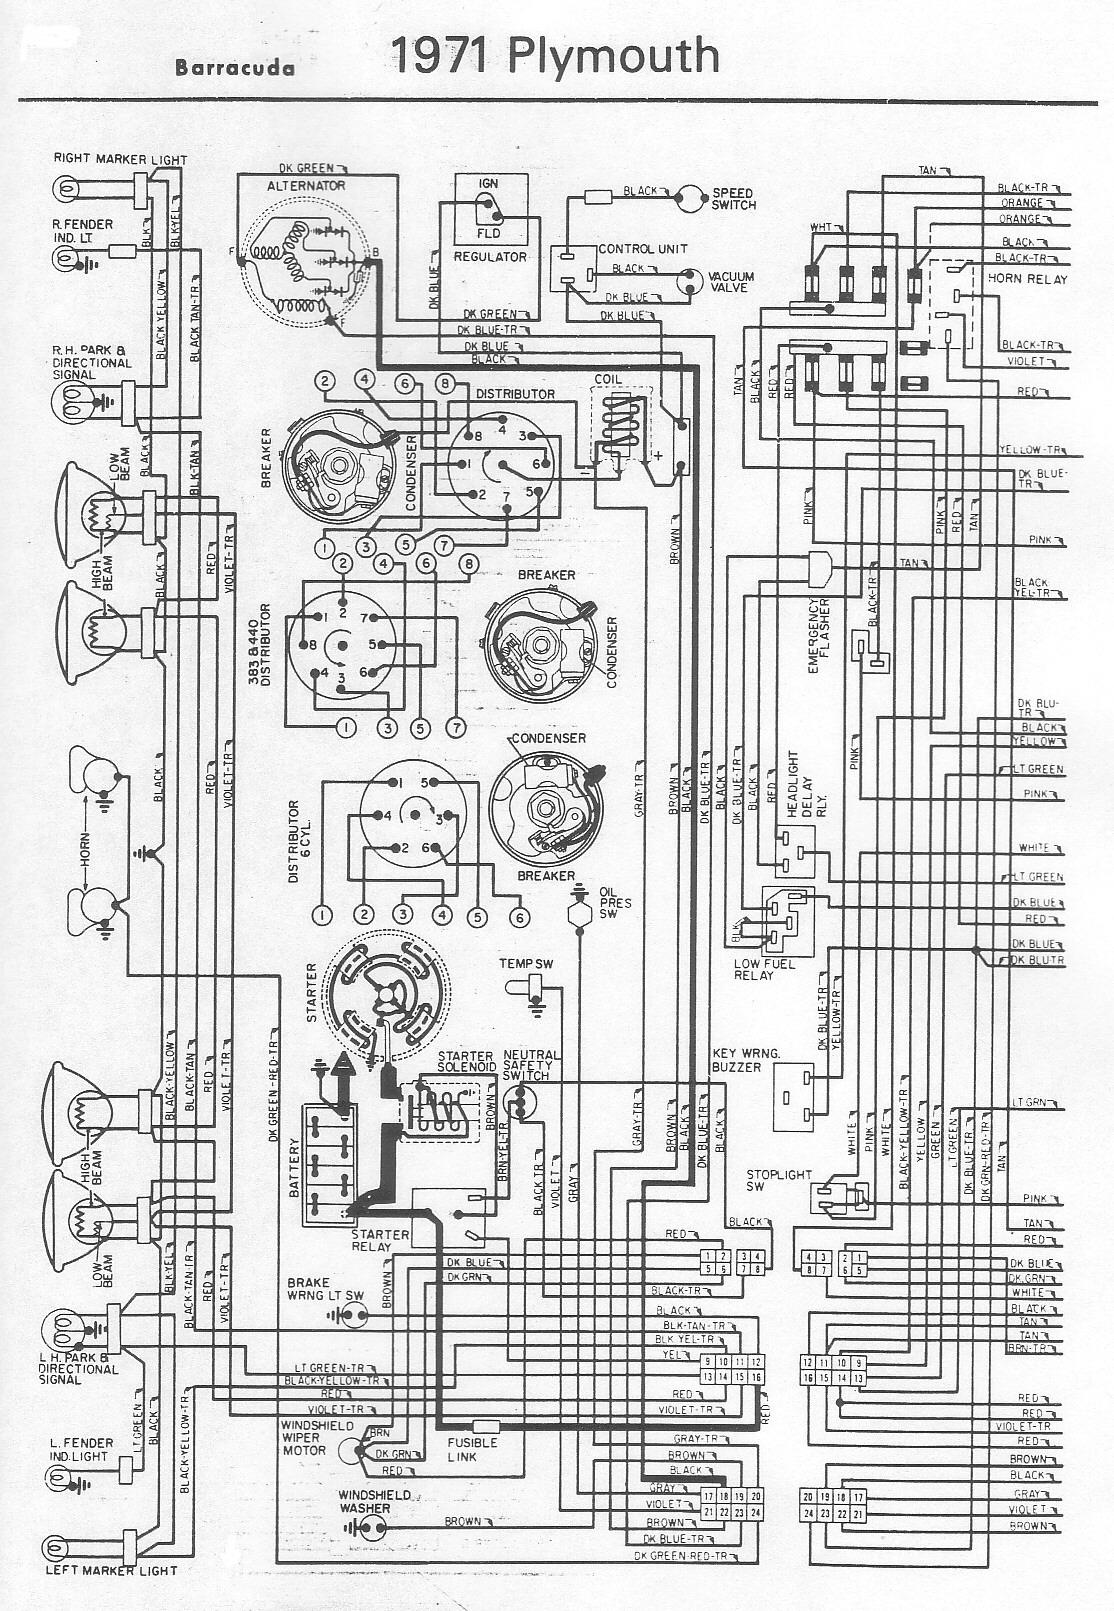 1970 Cuda Engine Wiring Diagram. Mopar Ignition Switch Wiring ...  Cuda Ignition Wiring Diagram on 1969 camaro wiring diagram, 1971 cuda seats, 1970 trans am wiring diagram, 1962 corvette wiring diagram, 1968 firebird wiring diagram, 1969 barracuda wiring diagram, 1969 road runner wiring diagram, 1969 corvette wiring diagram, 1969 gtx wiring diagram, 1968 corvette wiring diagram, 1971 cuda radio, 1967 corvette wiring diagram, 1971 cuda engine,